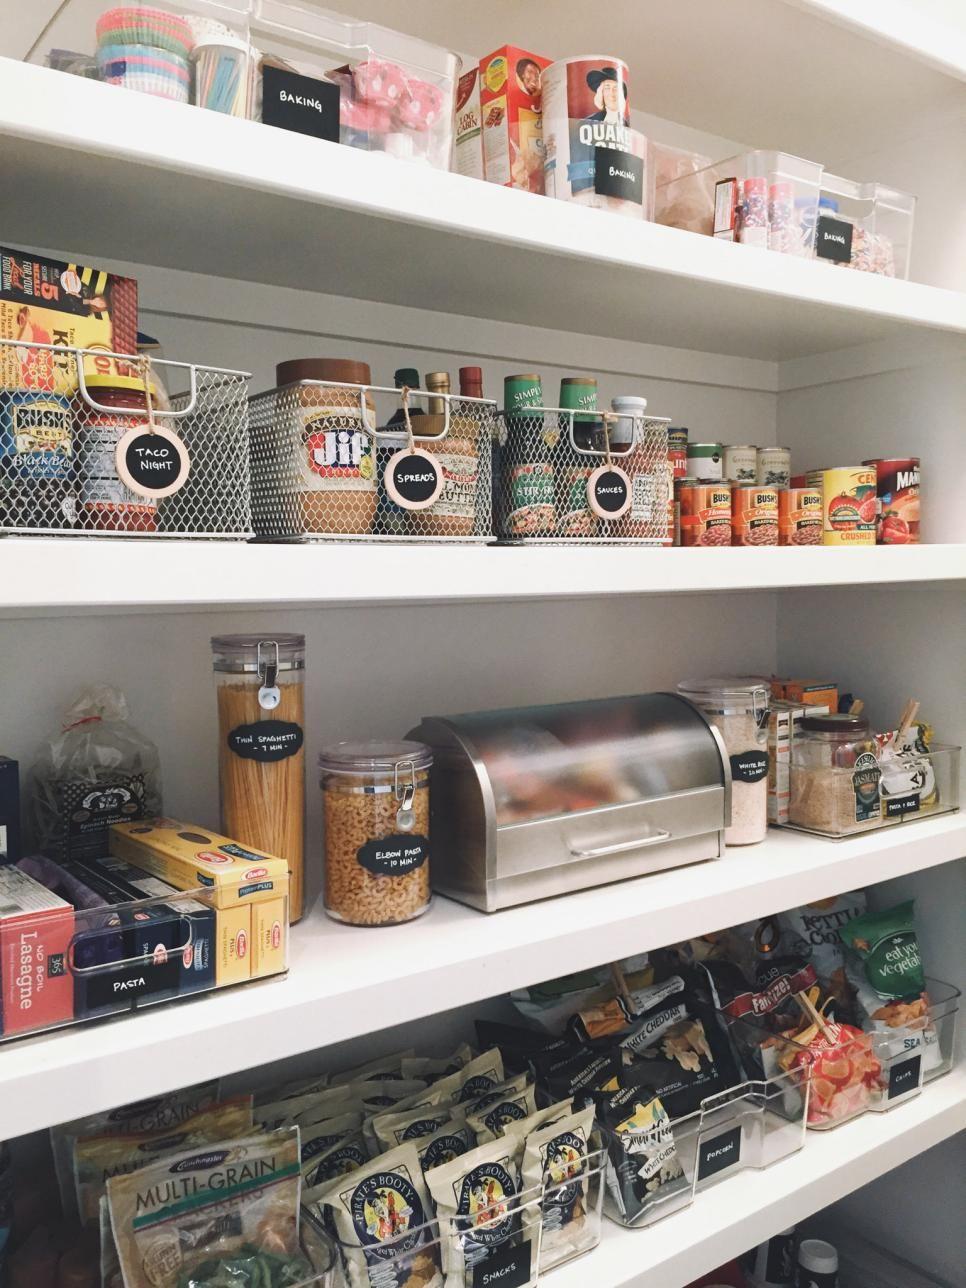 16 Small Pantry Organization Ideas Small Pantry Organization Kitchen Organization Pantry Deep Pantry Organization